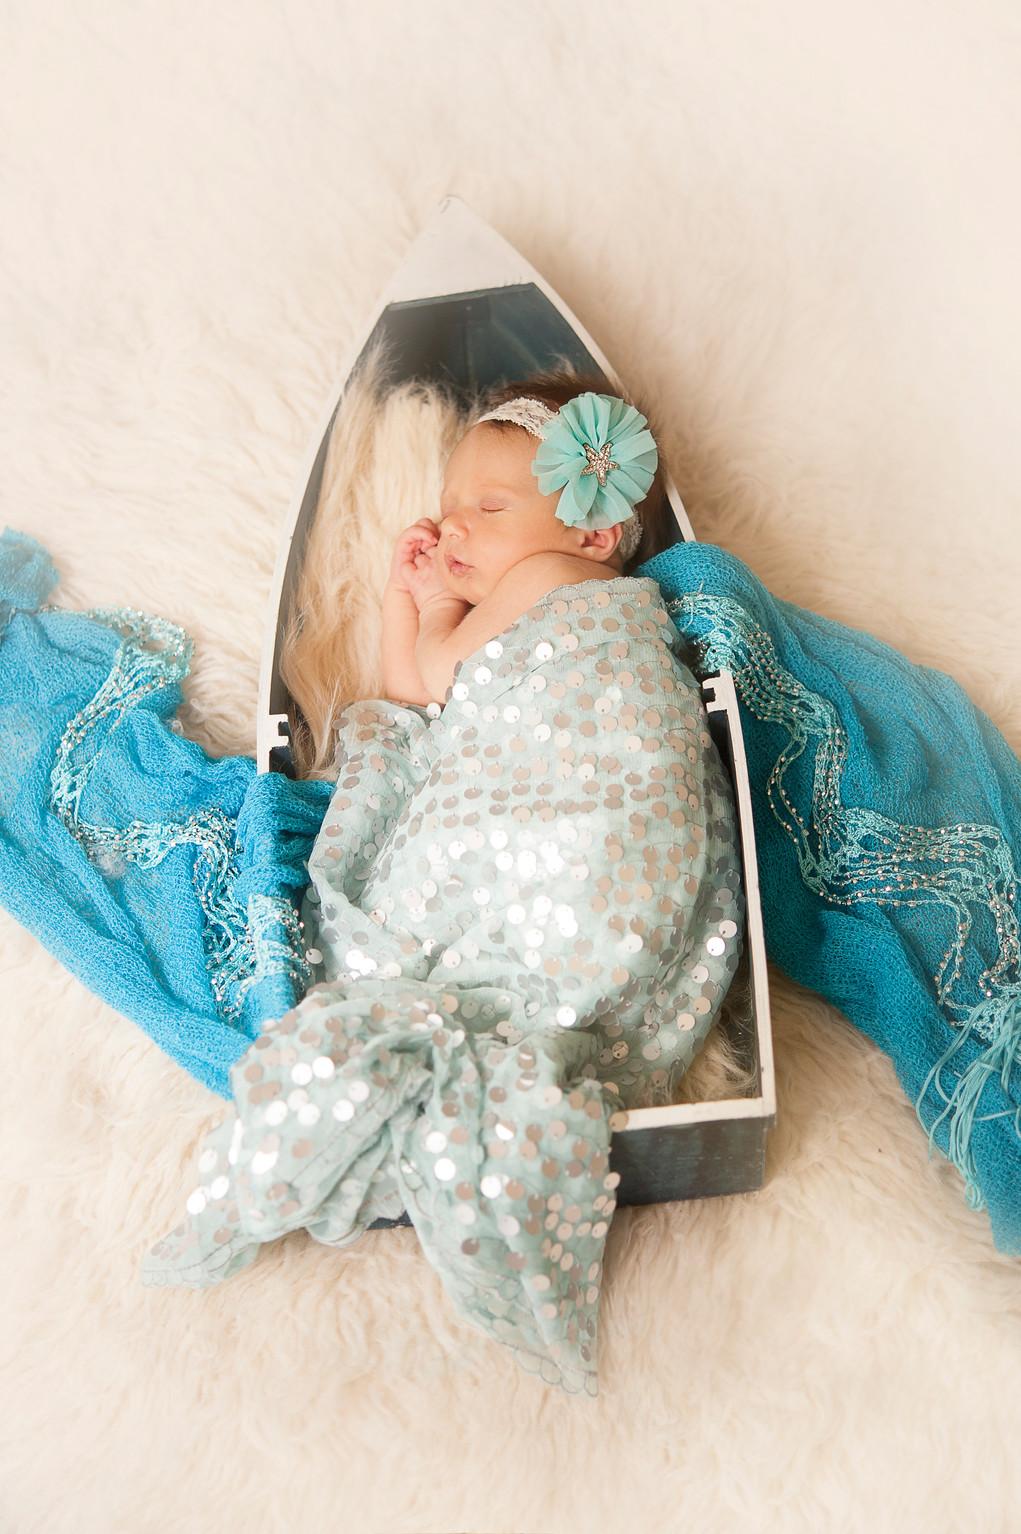 Mermaid Newborn Session